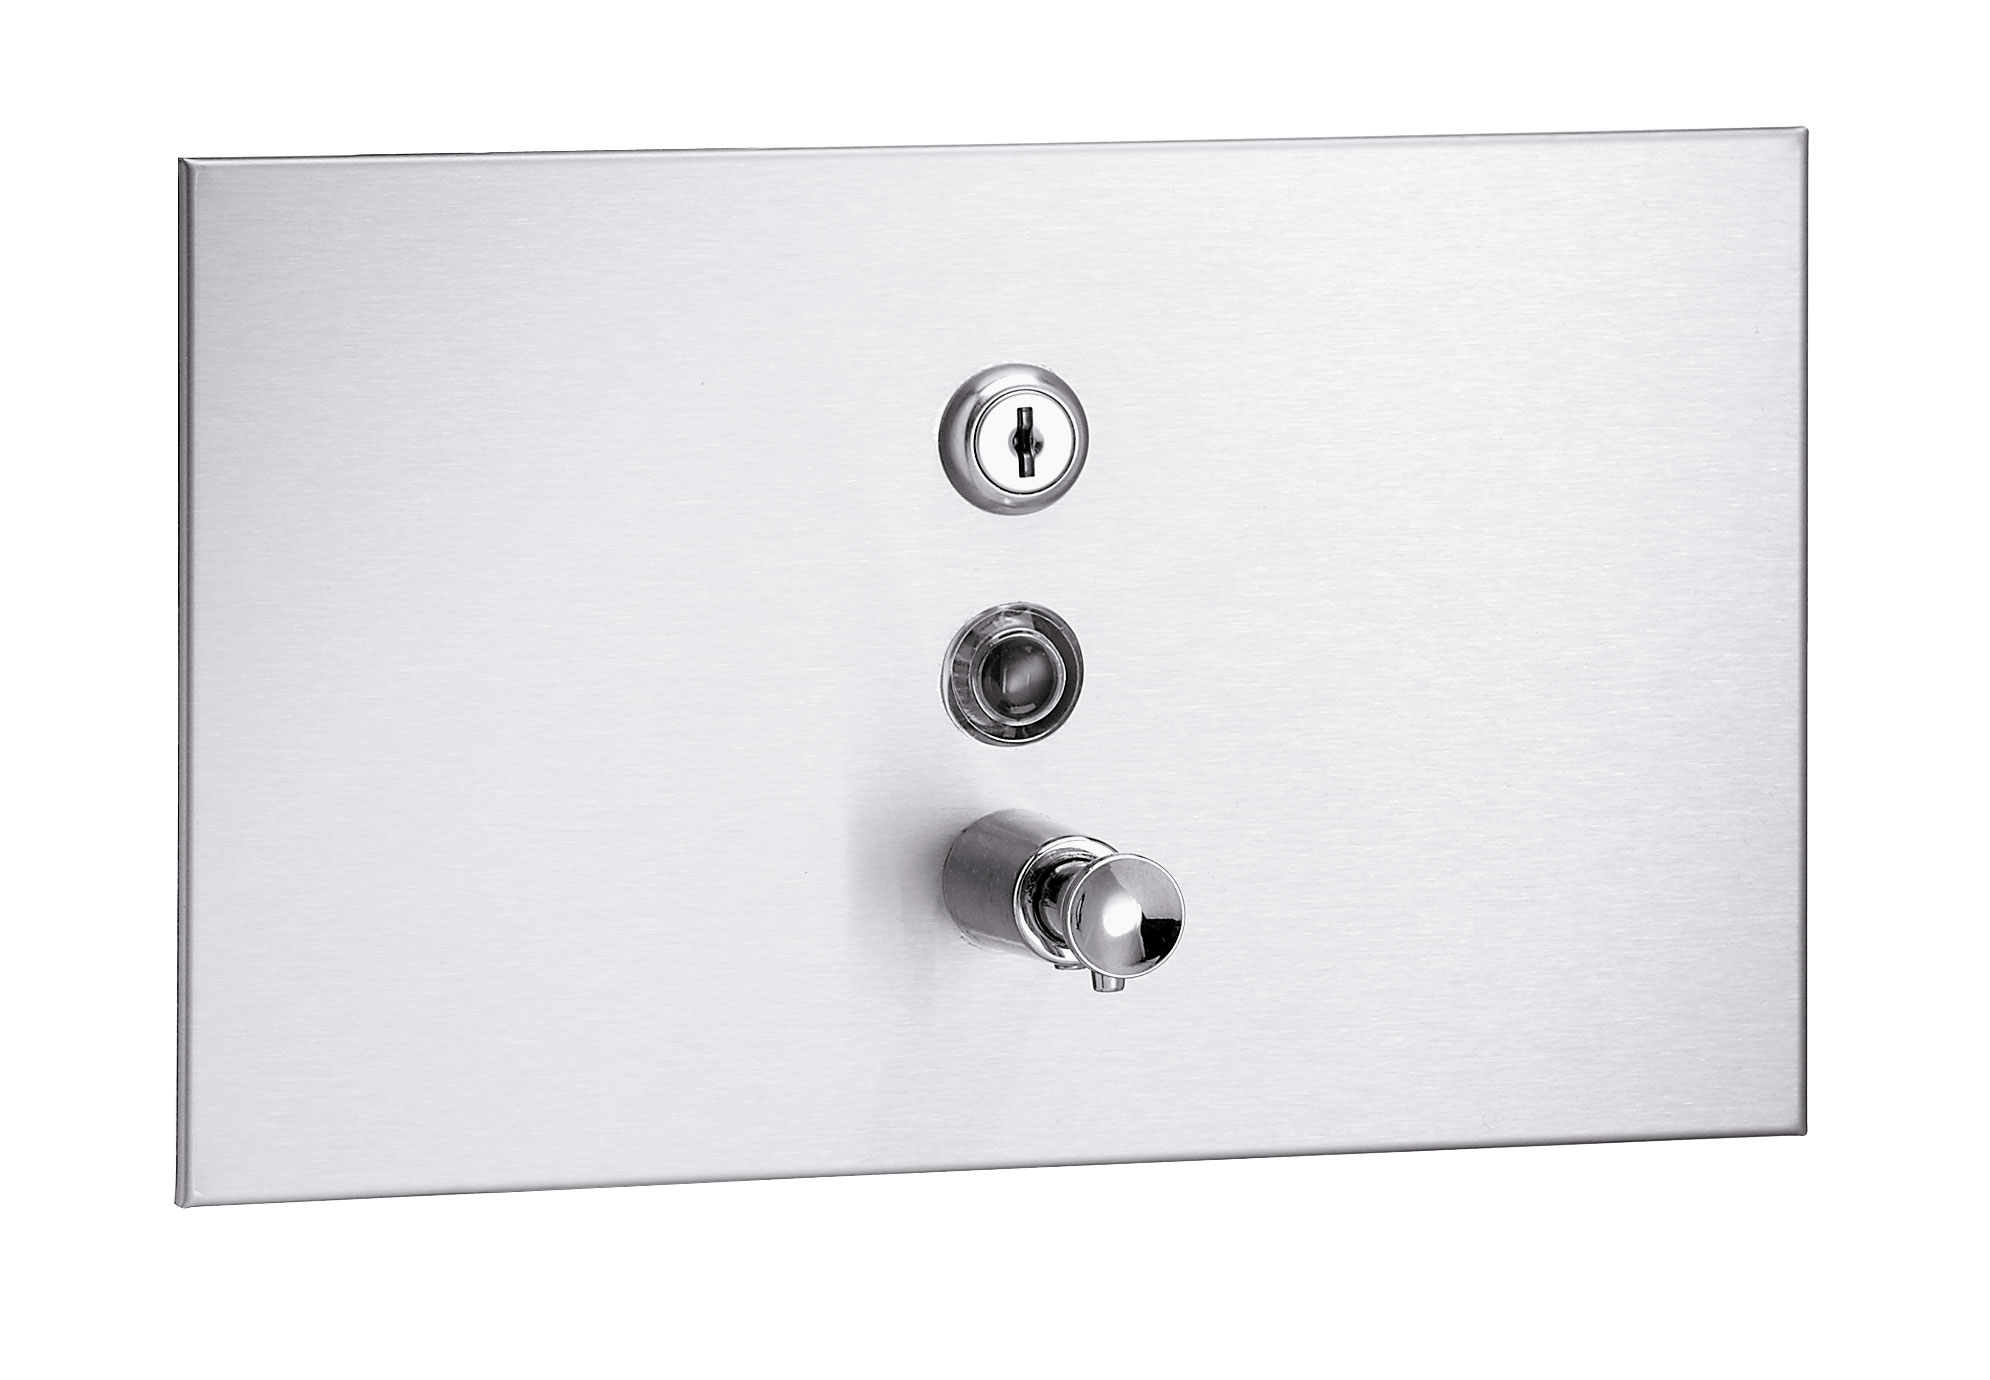 Bradley 6437 Recessed Horizontal Soap Dispenser